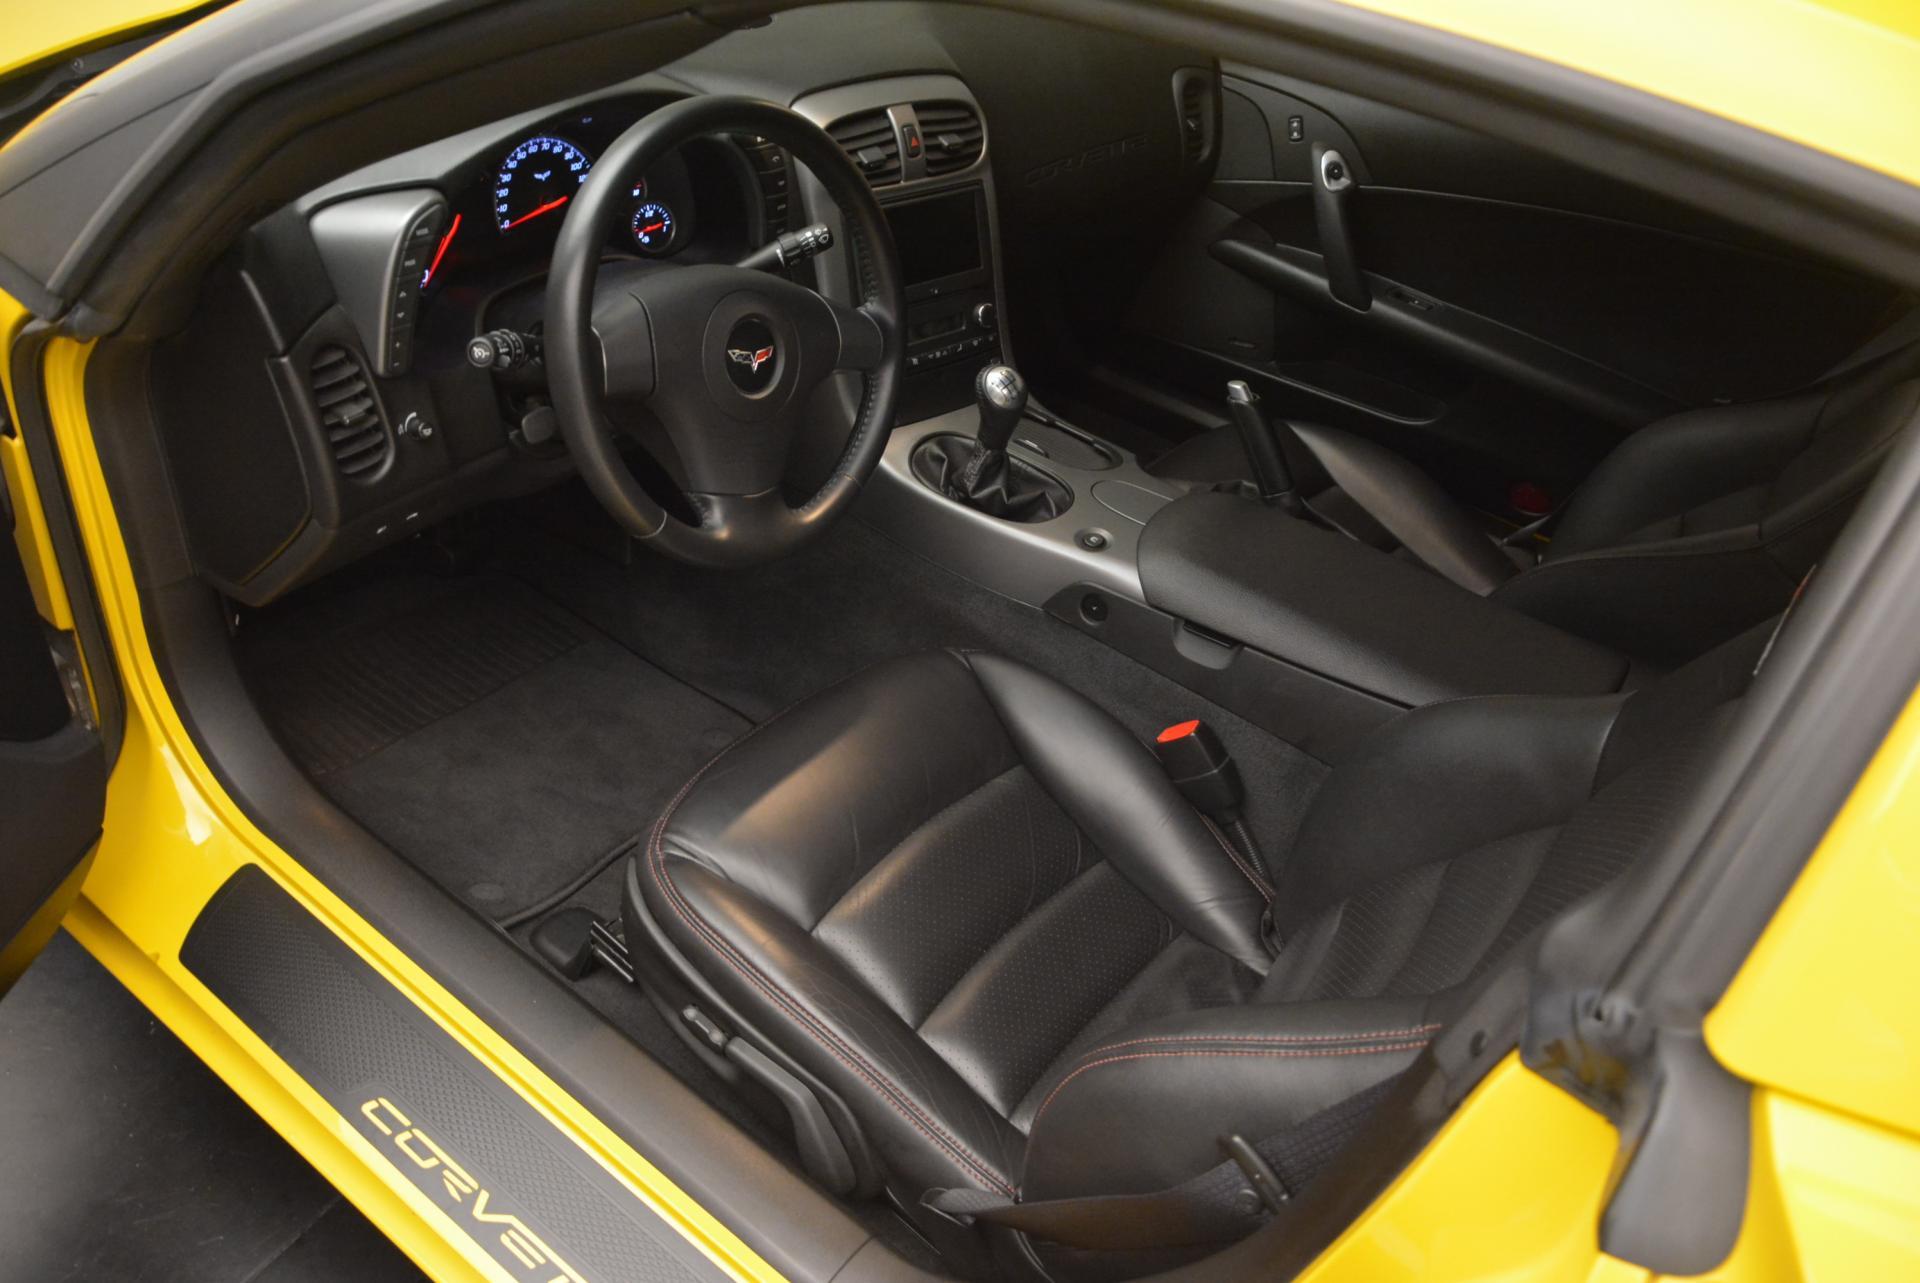 Used 2006 Chevrolet Corvette Z06 Hardtop For Sale In Westport, CT 530_p11